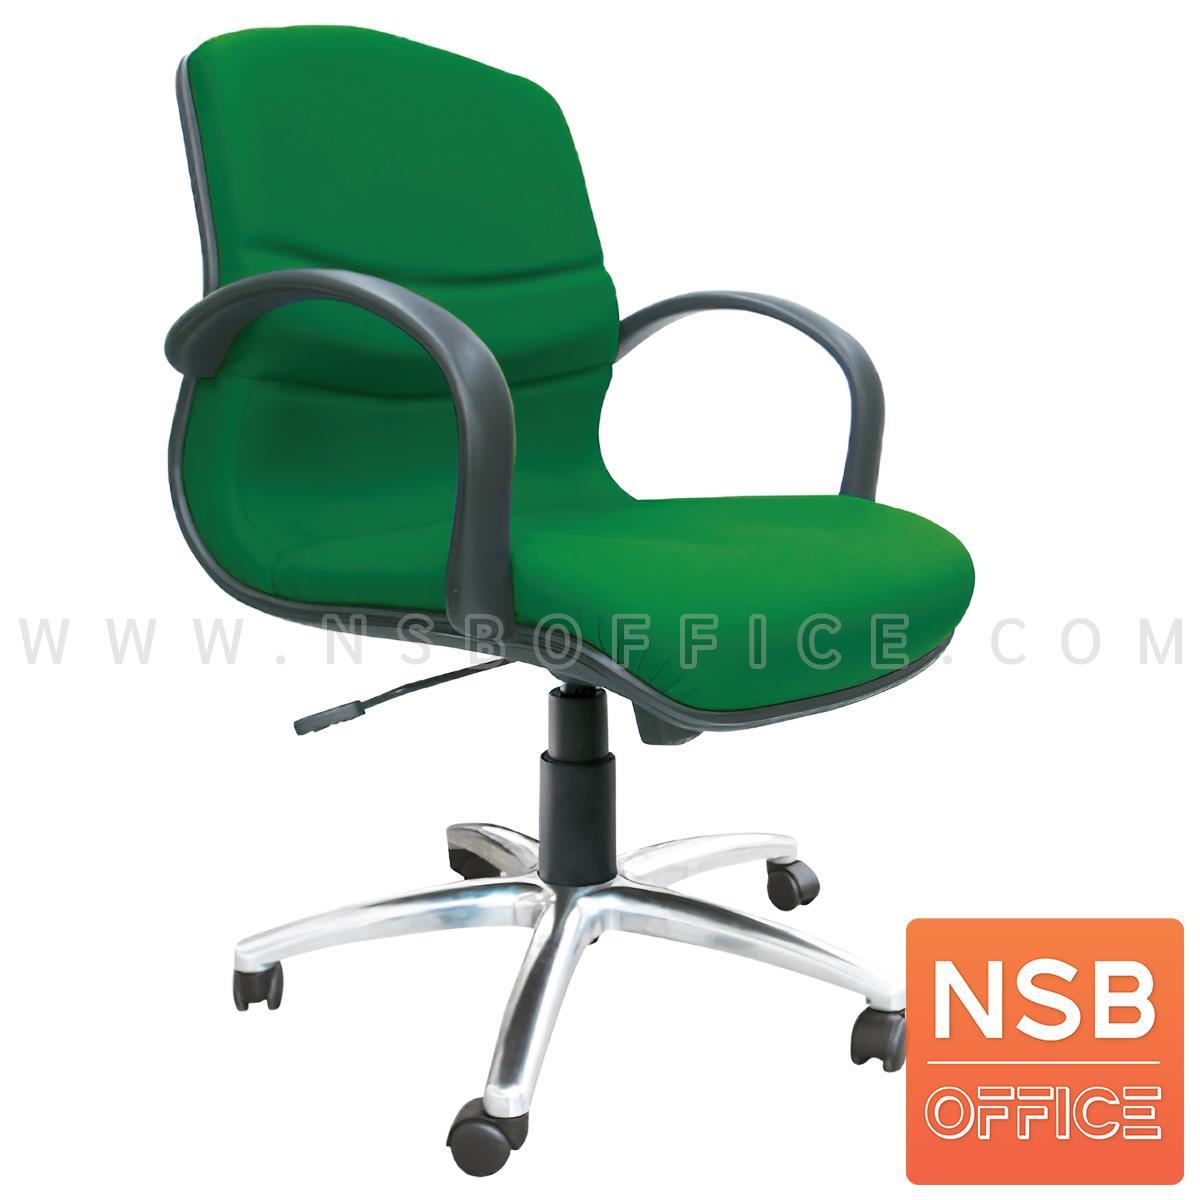 B03A511:เก้าอี้สำนักงานหุ้มหนัง รุ่น ALCO-2  โช๊คแก๊ส ขาอลูมิเนียม